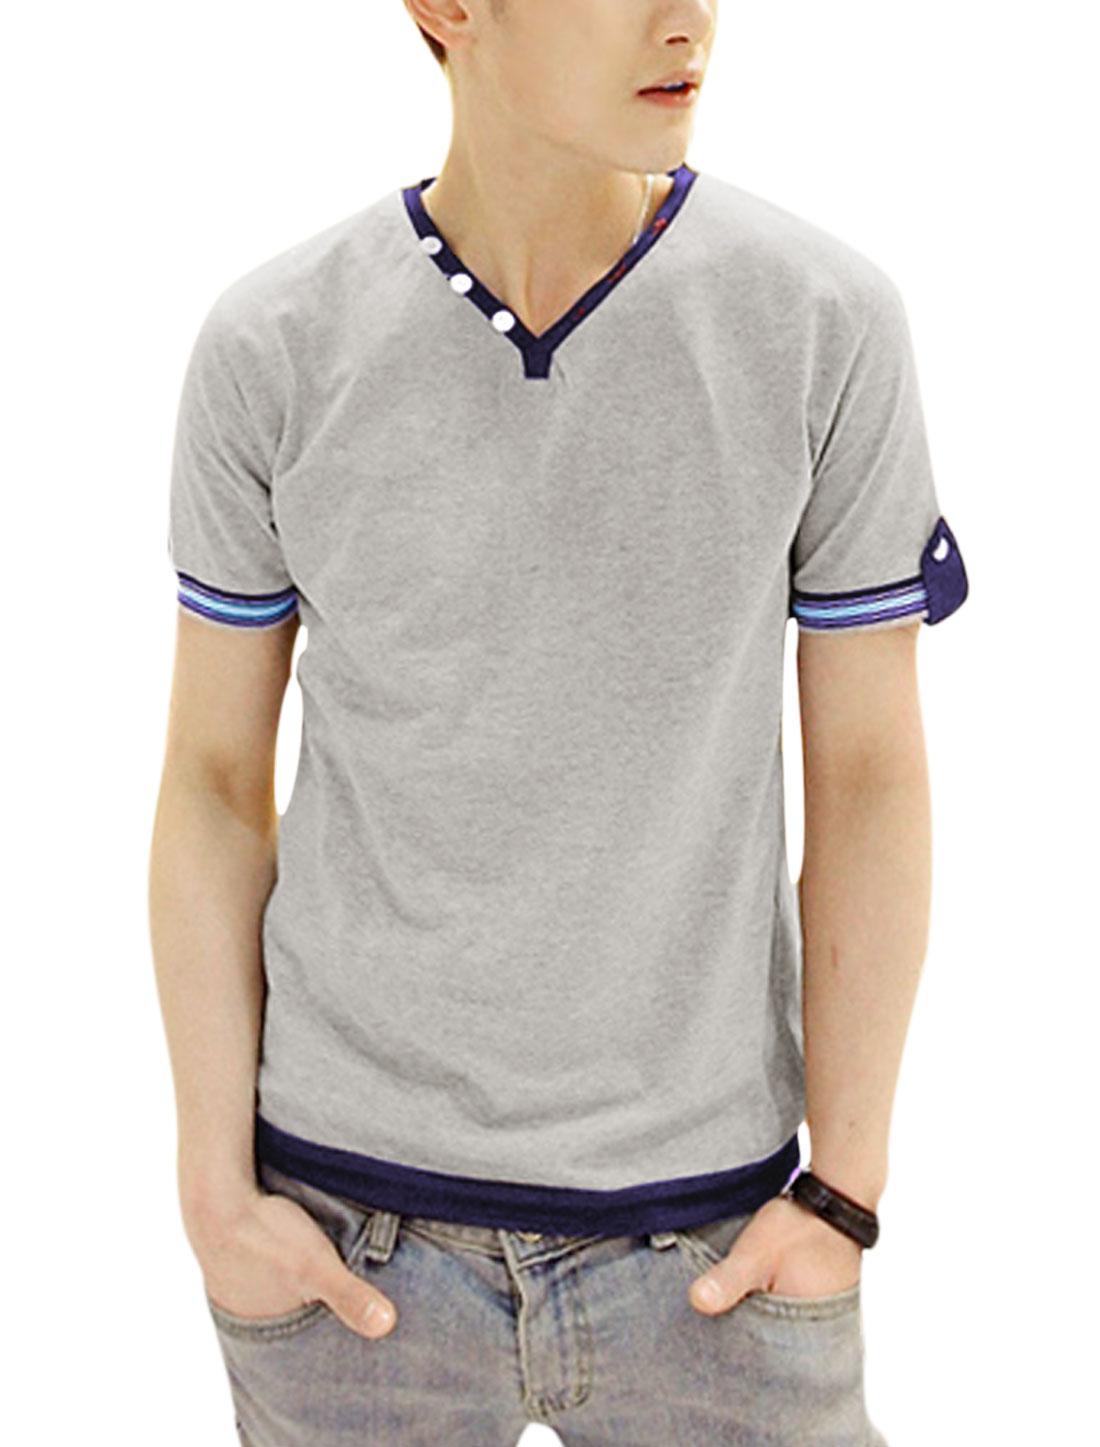 Men Stylish Denim Detail Button-tab Cuffs Casual Tee Shirt Light Gray S